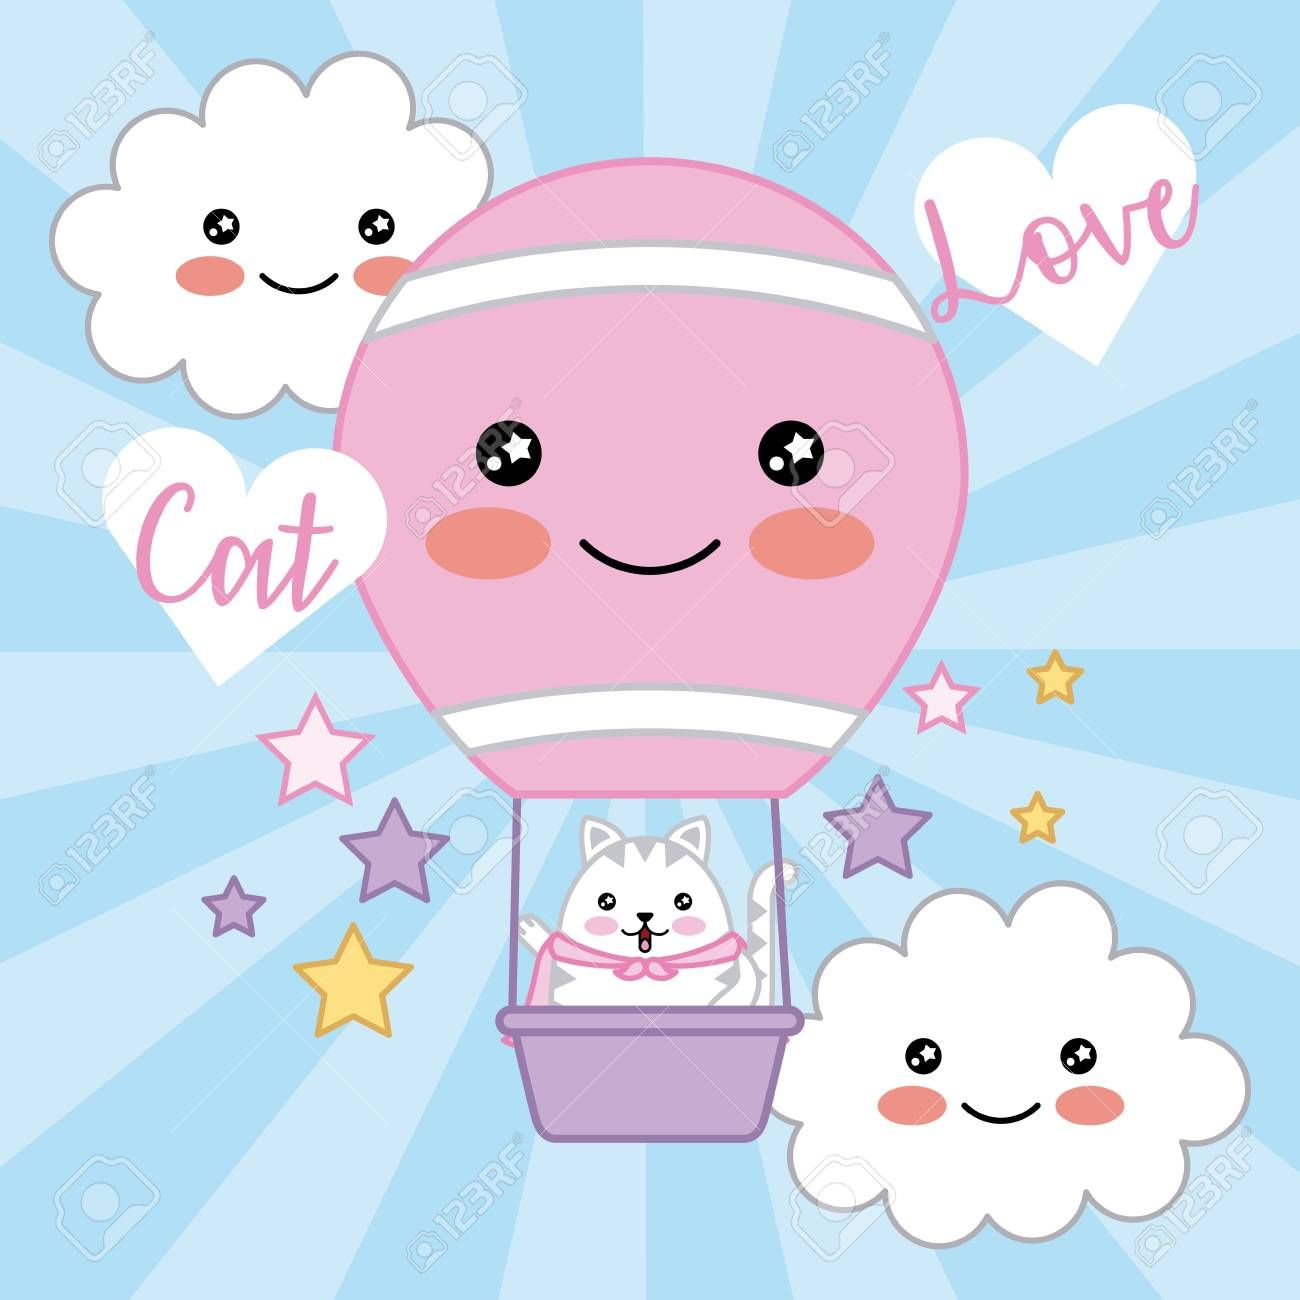 kawaii cat love air balloon clouds stars decoration vector illustration